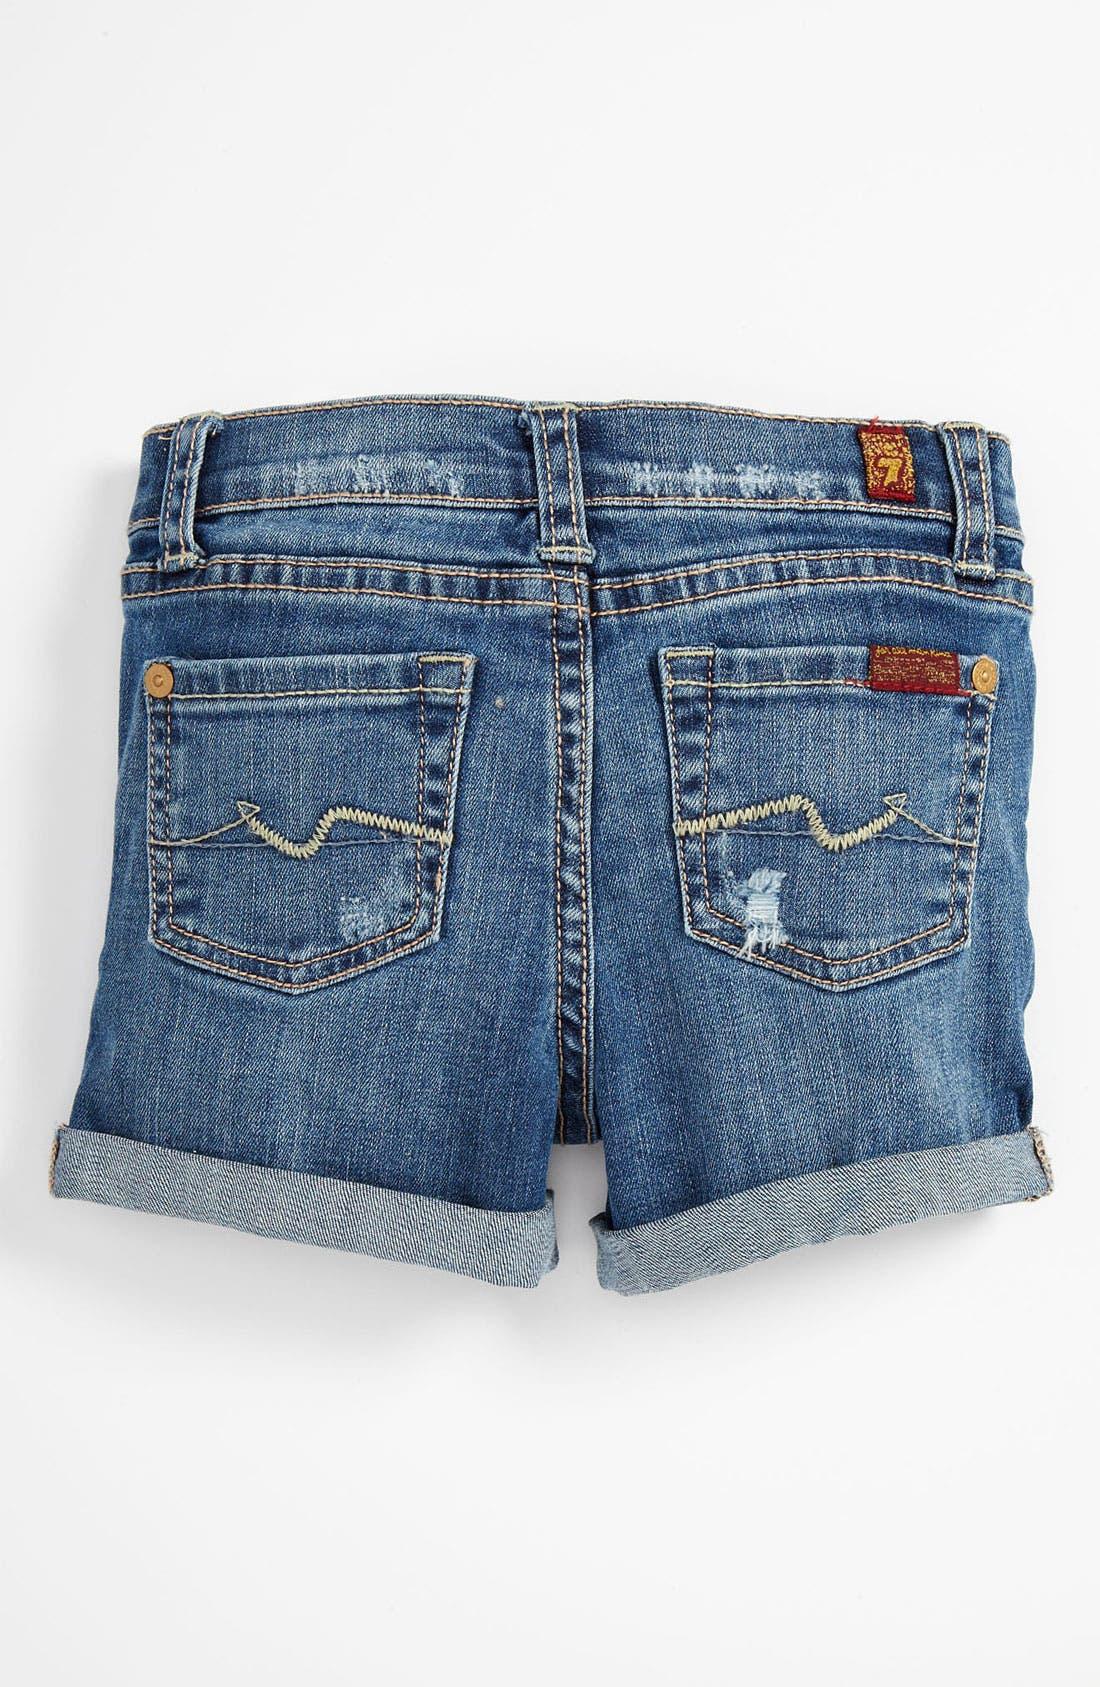 Alternate Image 1 Selected - 7 For All Mankind® Denim Shorts (Infant)